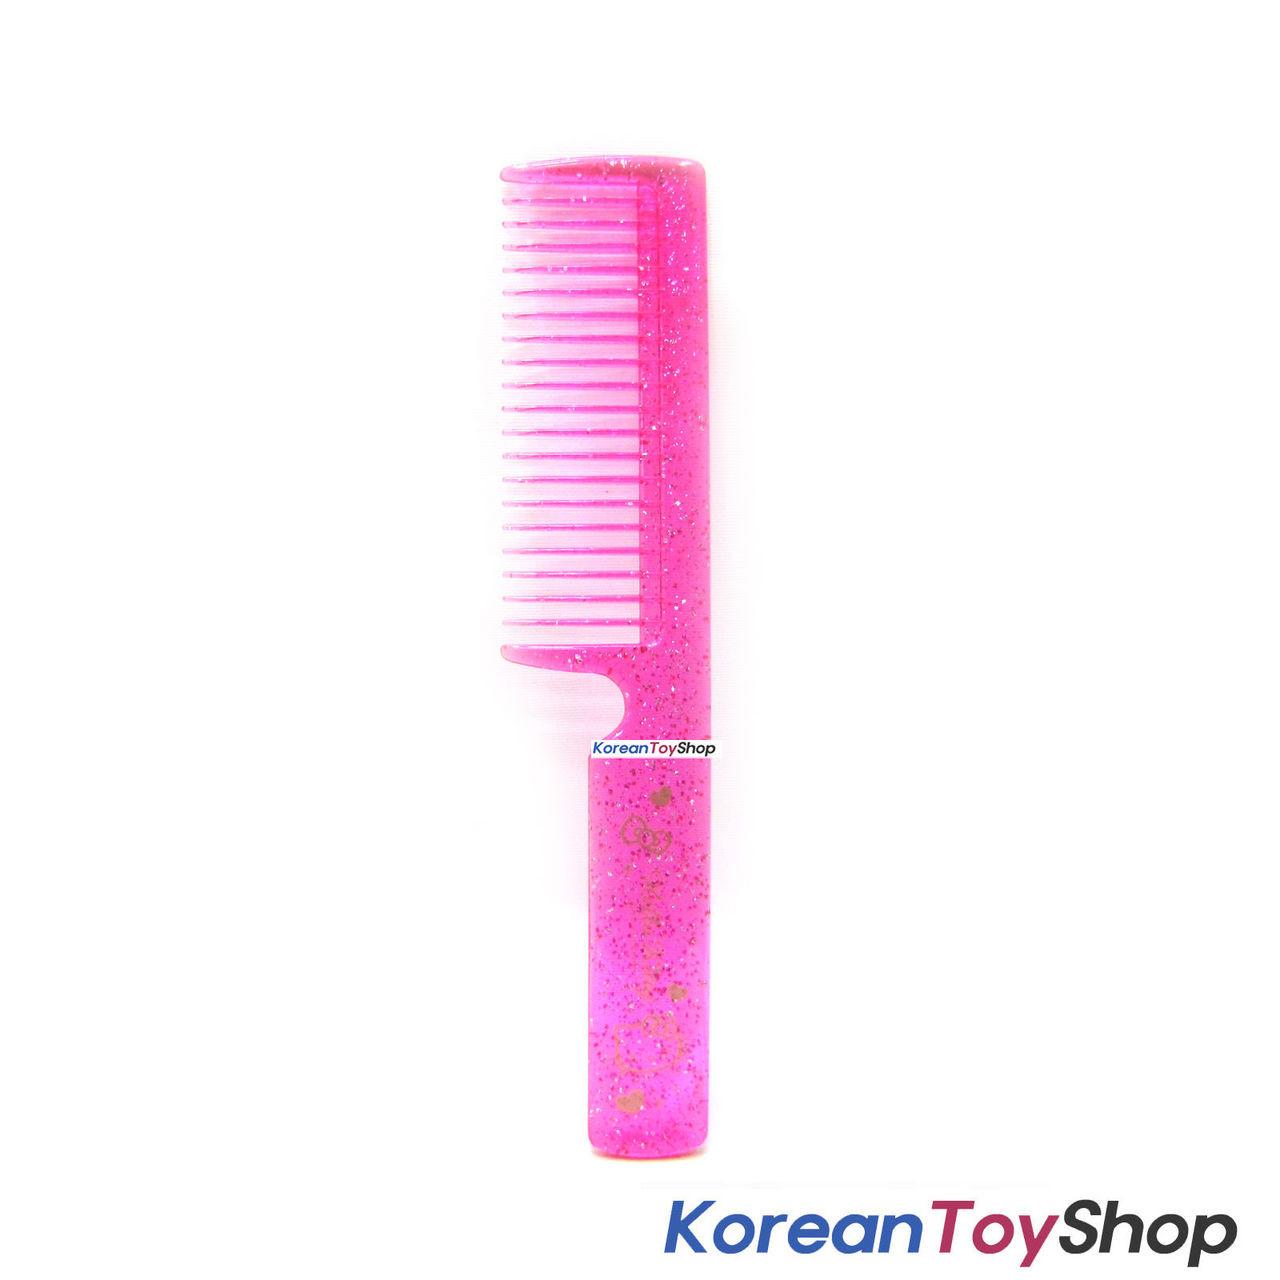 d17cbd958 Hello Kitty Hair Comb Pink Color w/ Glitter Decoration / Made in Korea -  KoreanToyShop